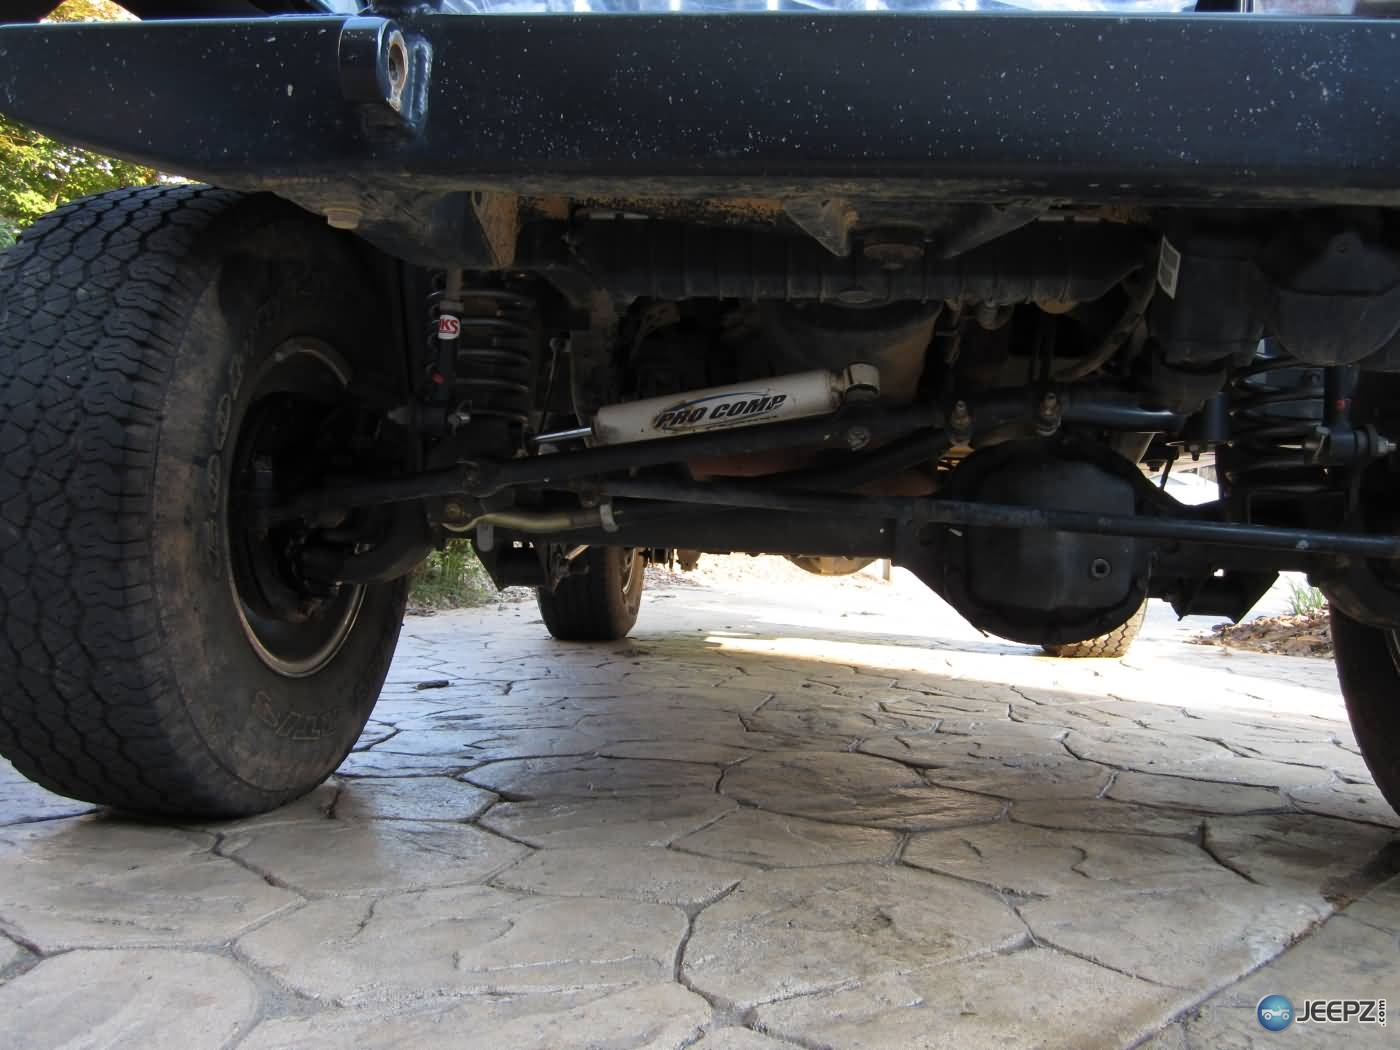 Installing A Wrangler Steering Stabilizer Wrangler Steering Stabilizer